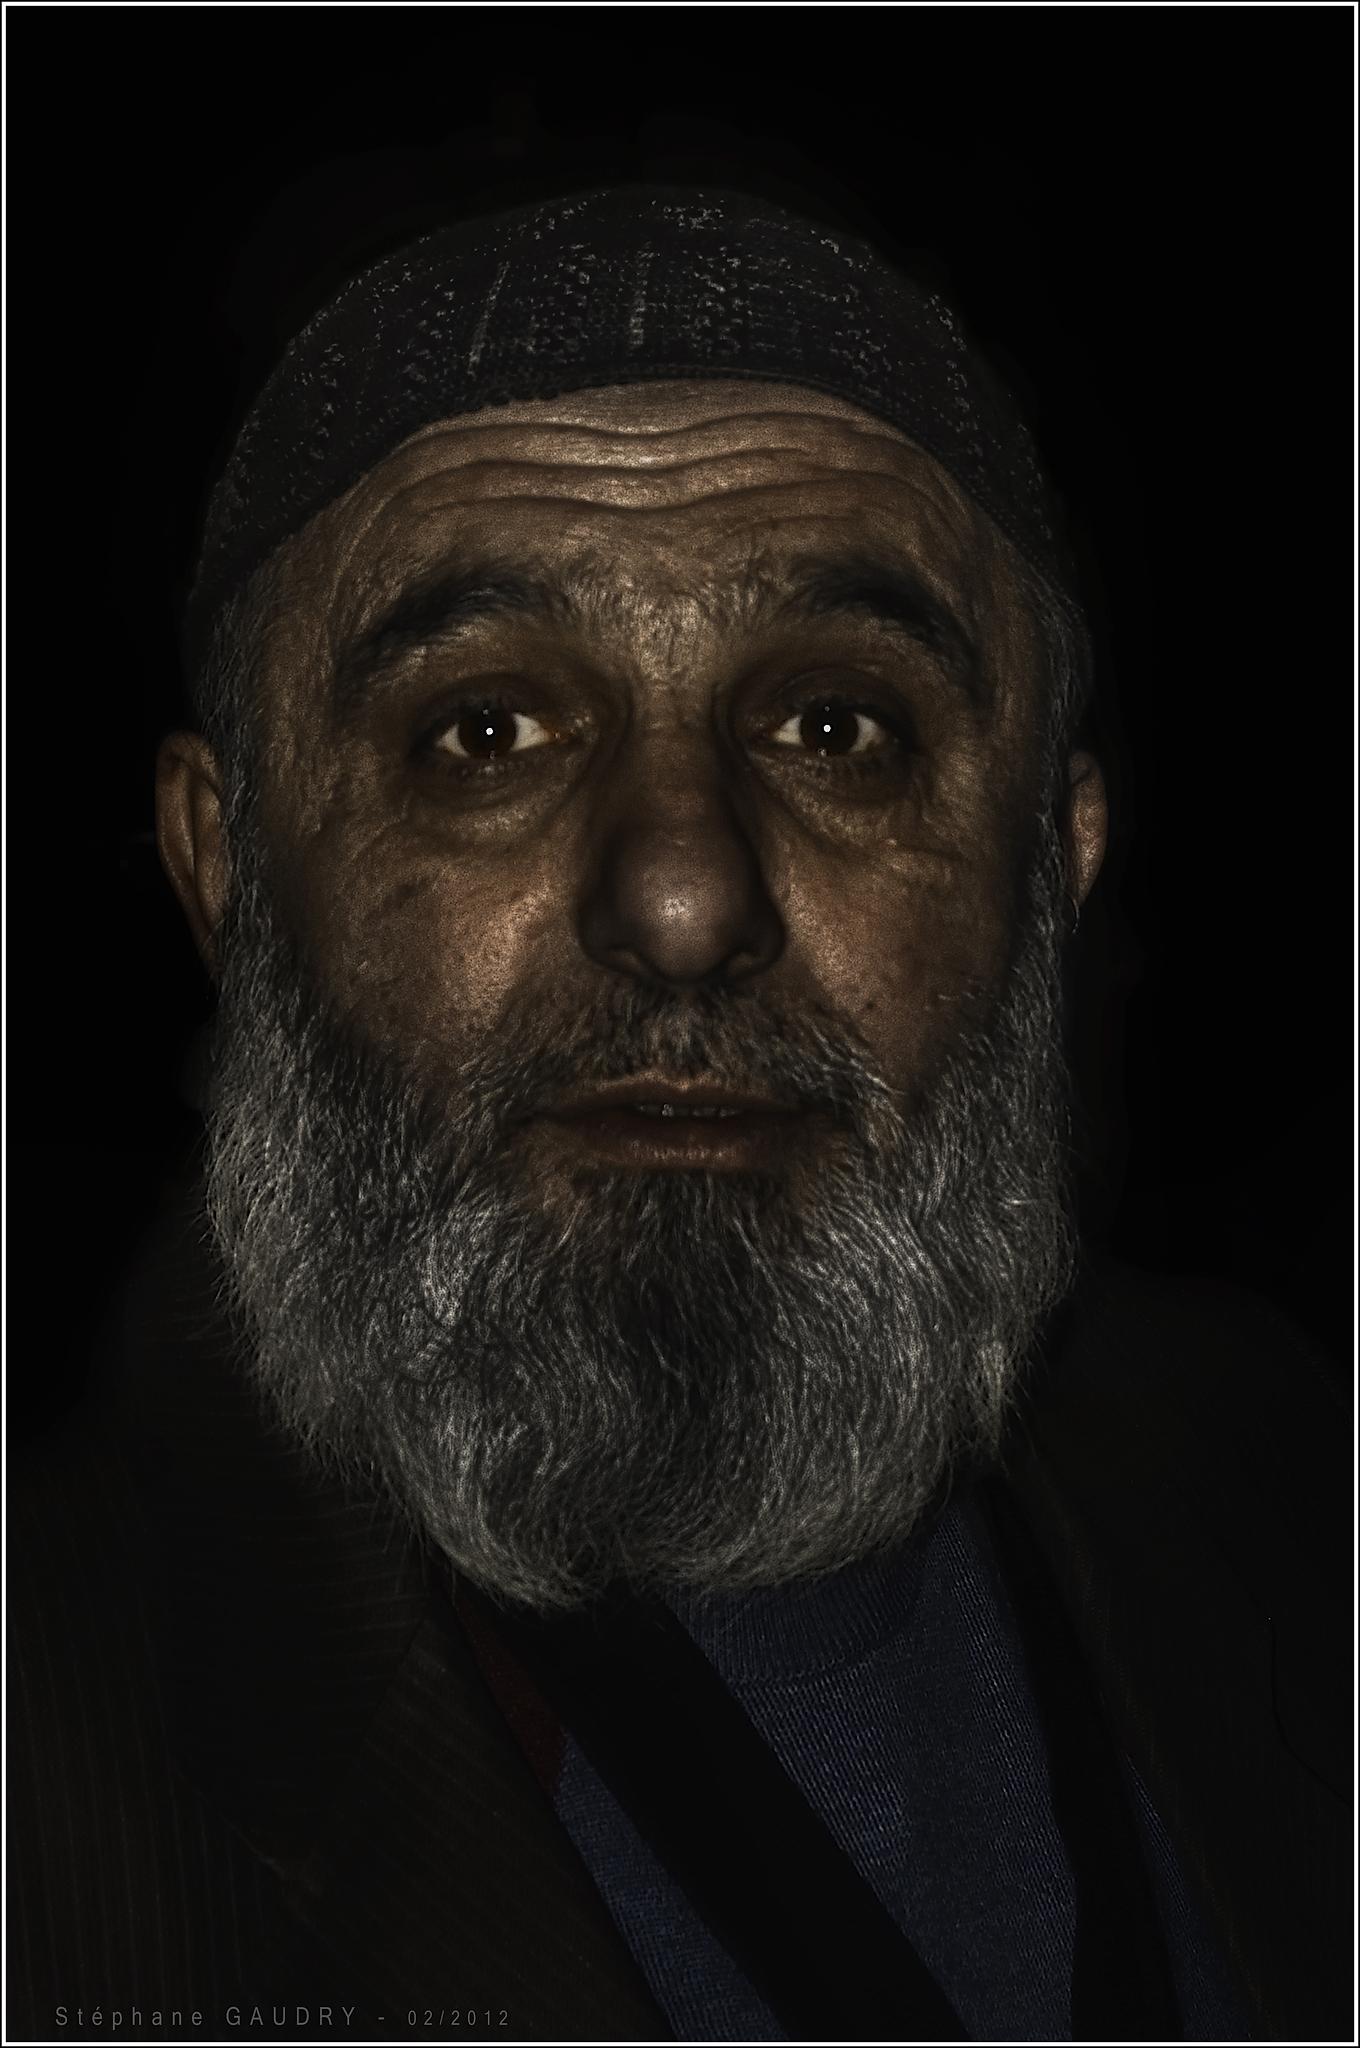 Istanbul, Portrait 201202-5 [Click to start slideshow]